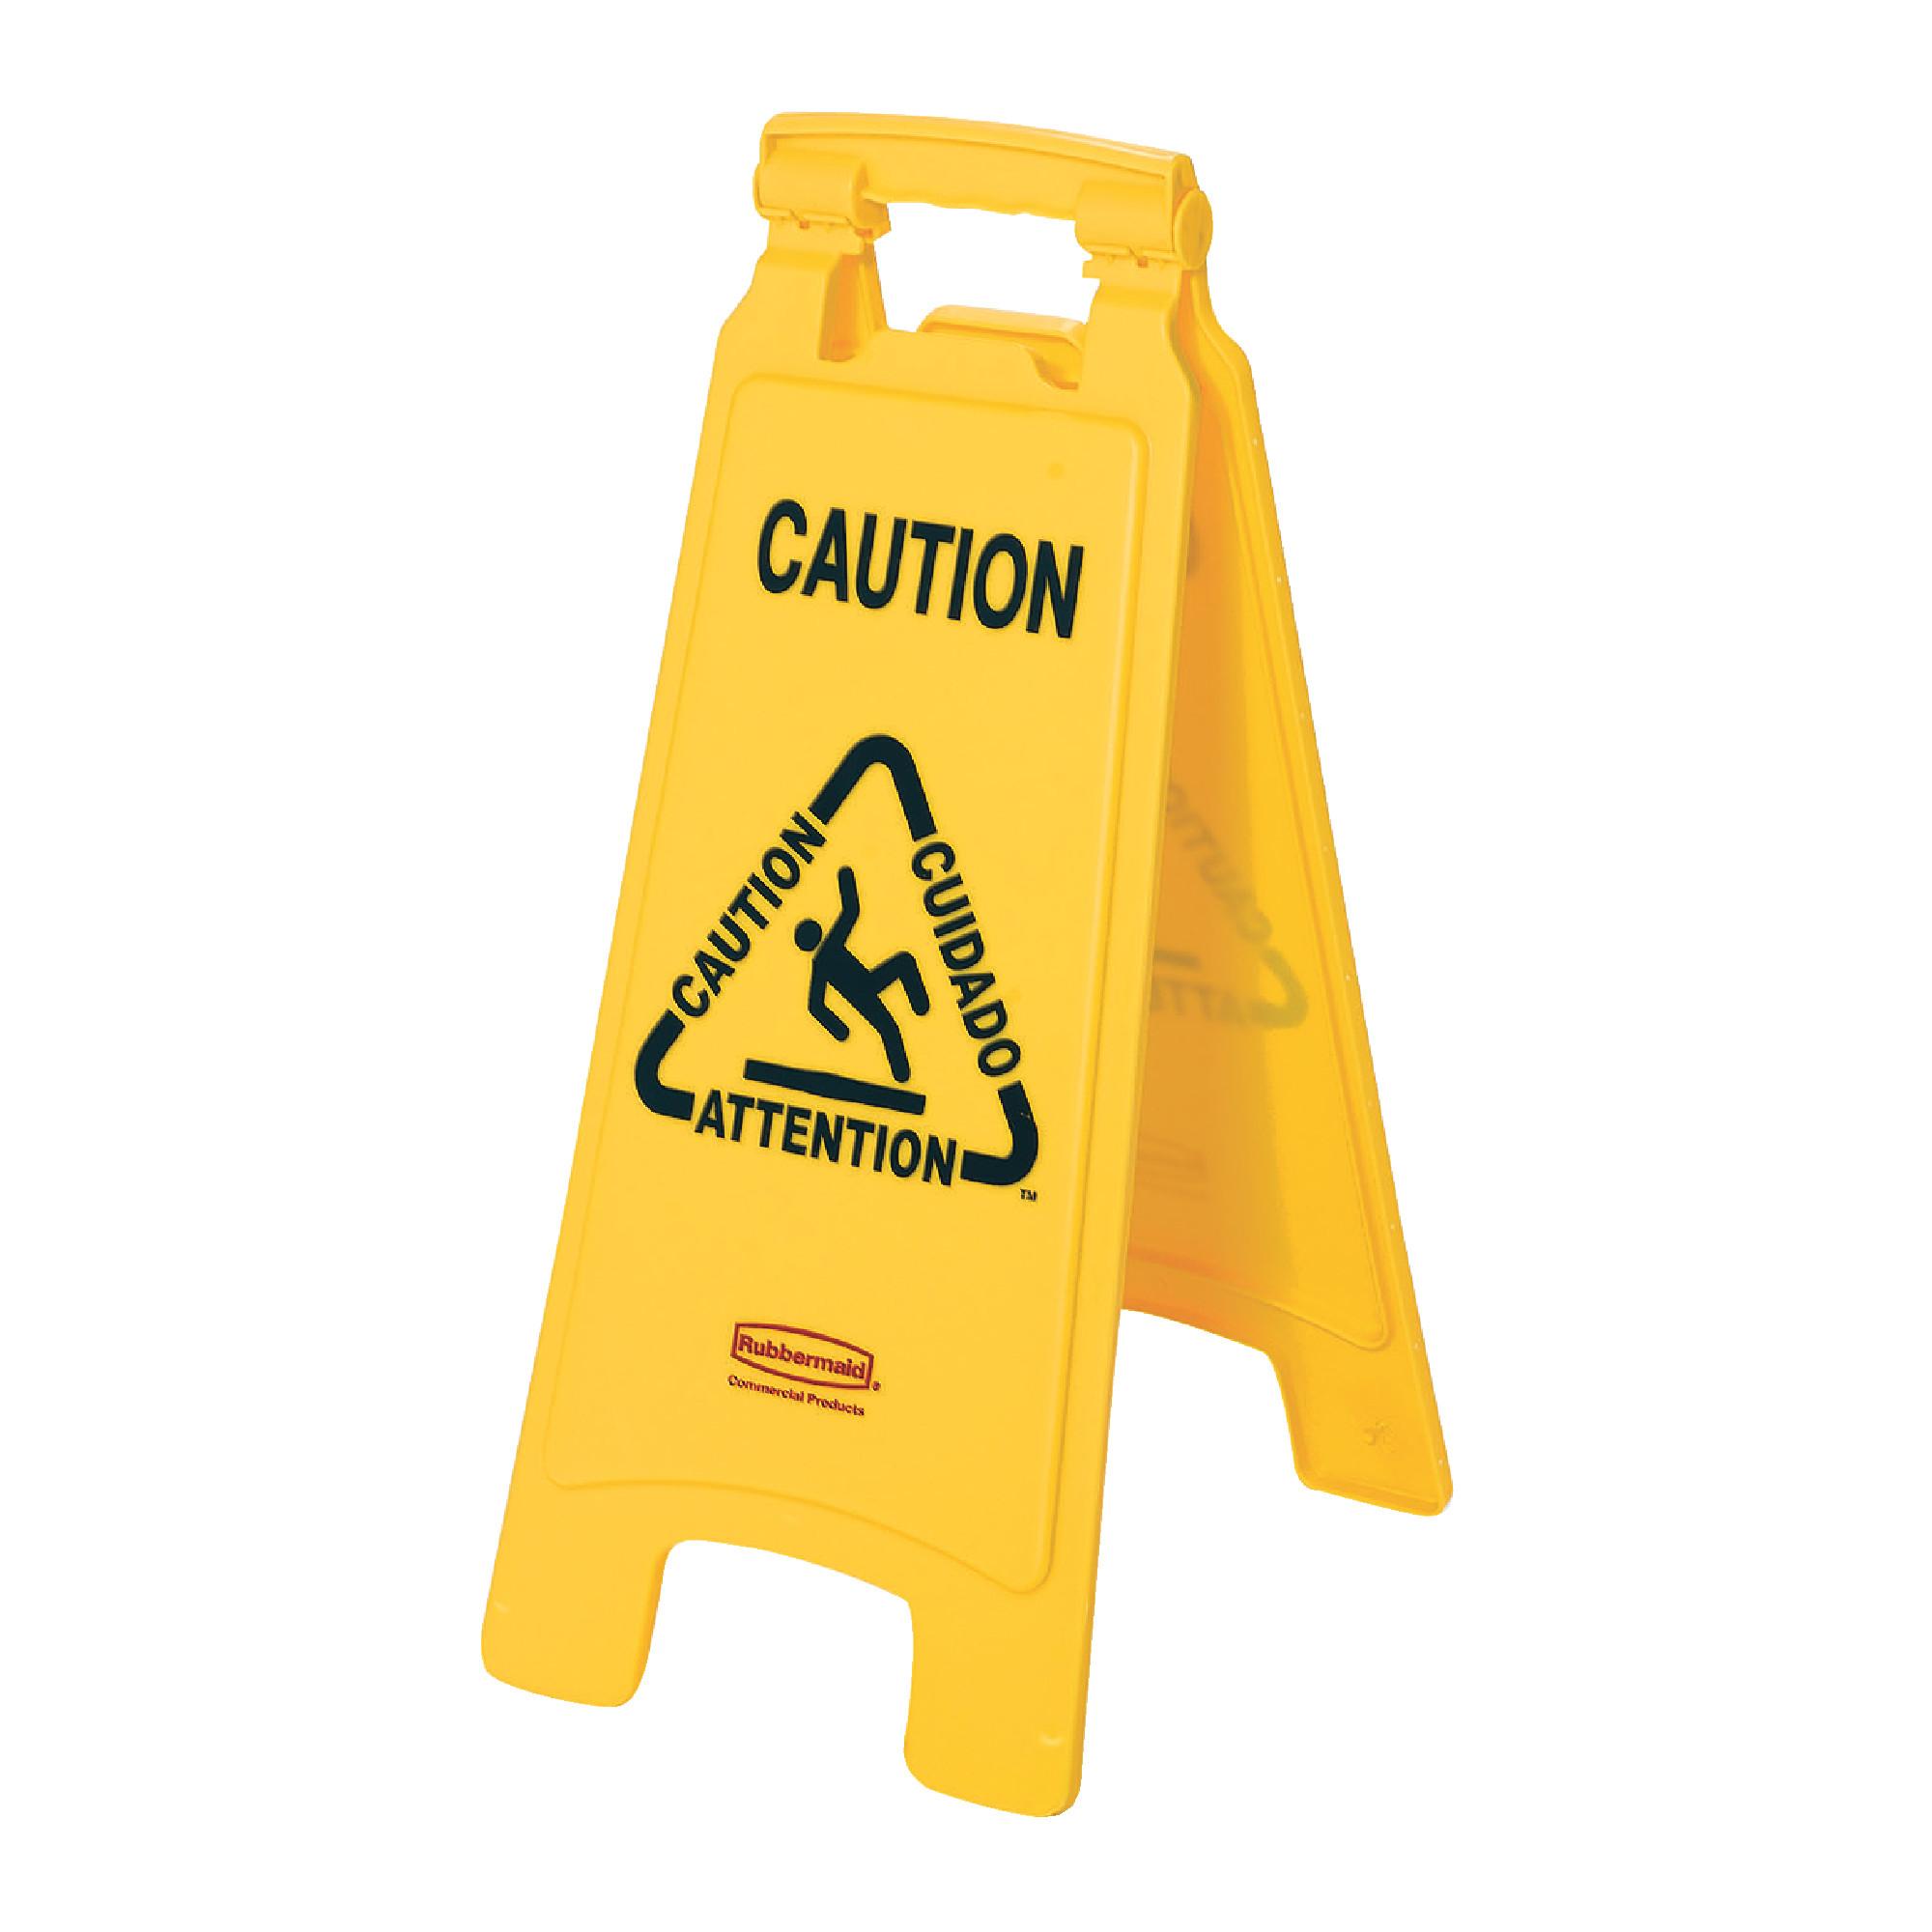 2 Sided Wet Floor Sign